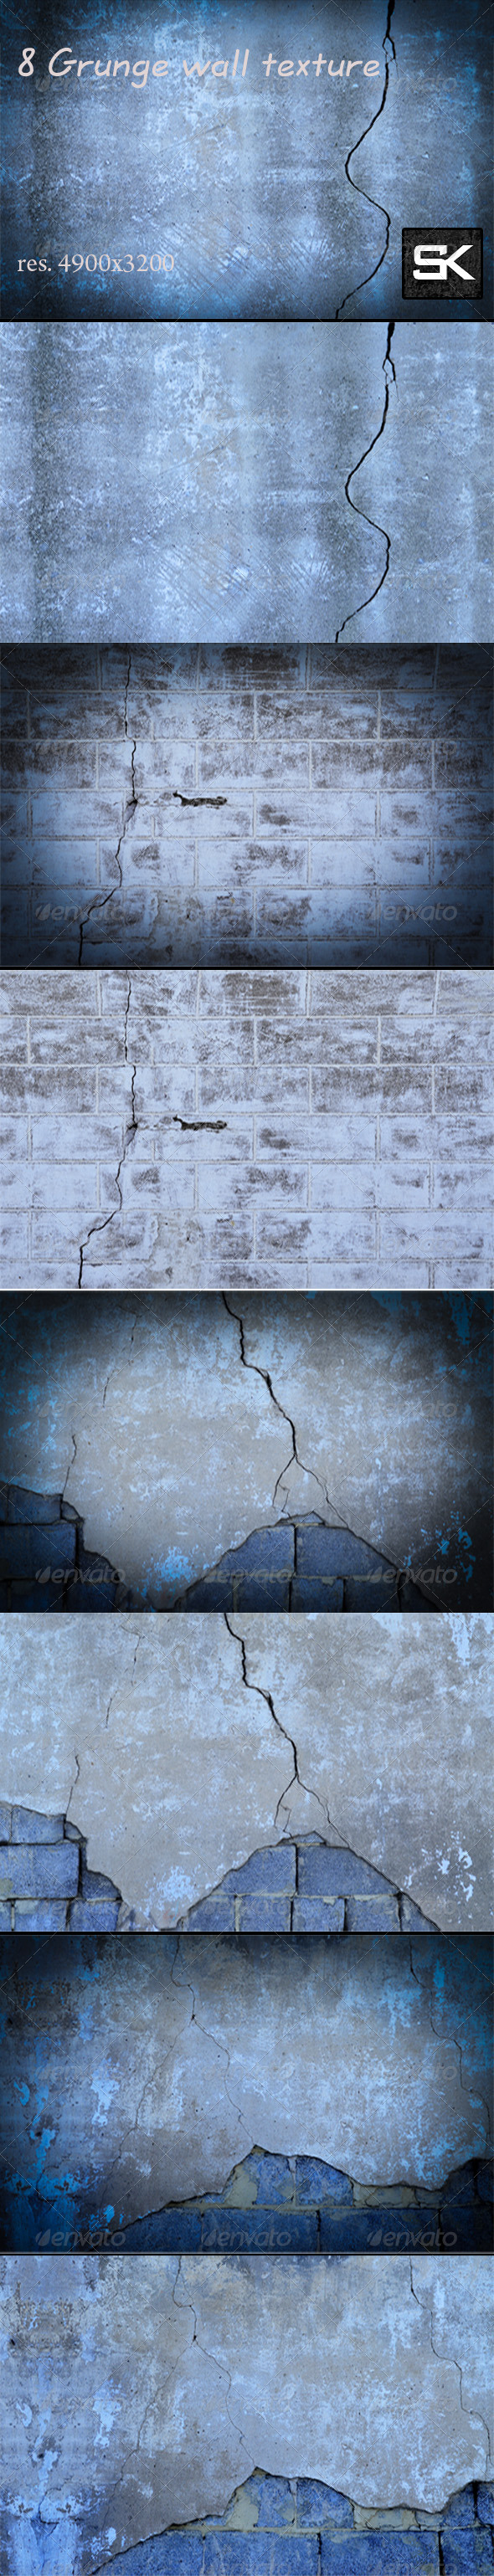 Grunge wall texture - Industrial / Grunge Textures